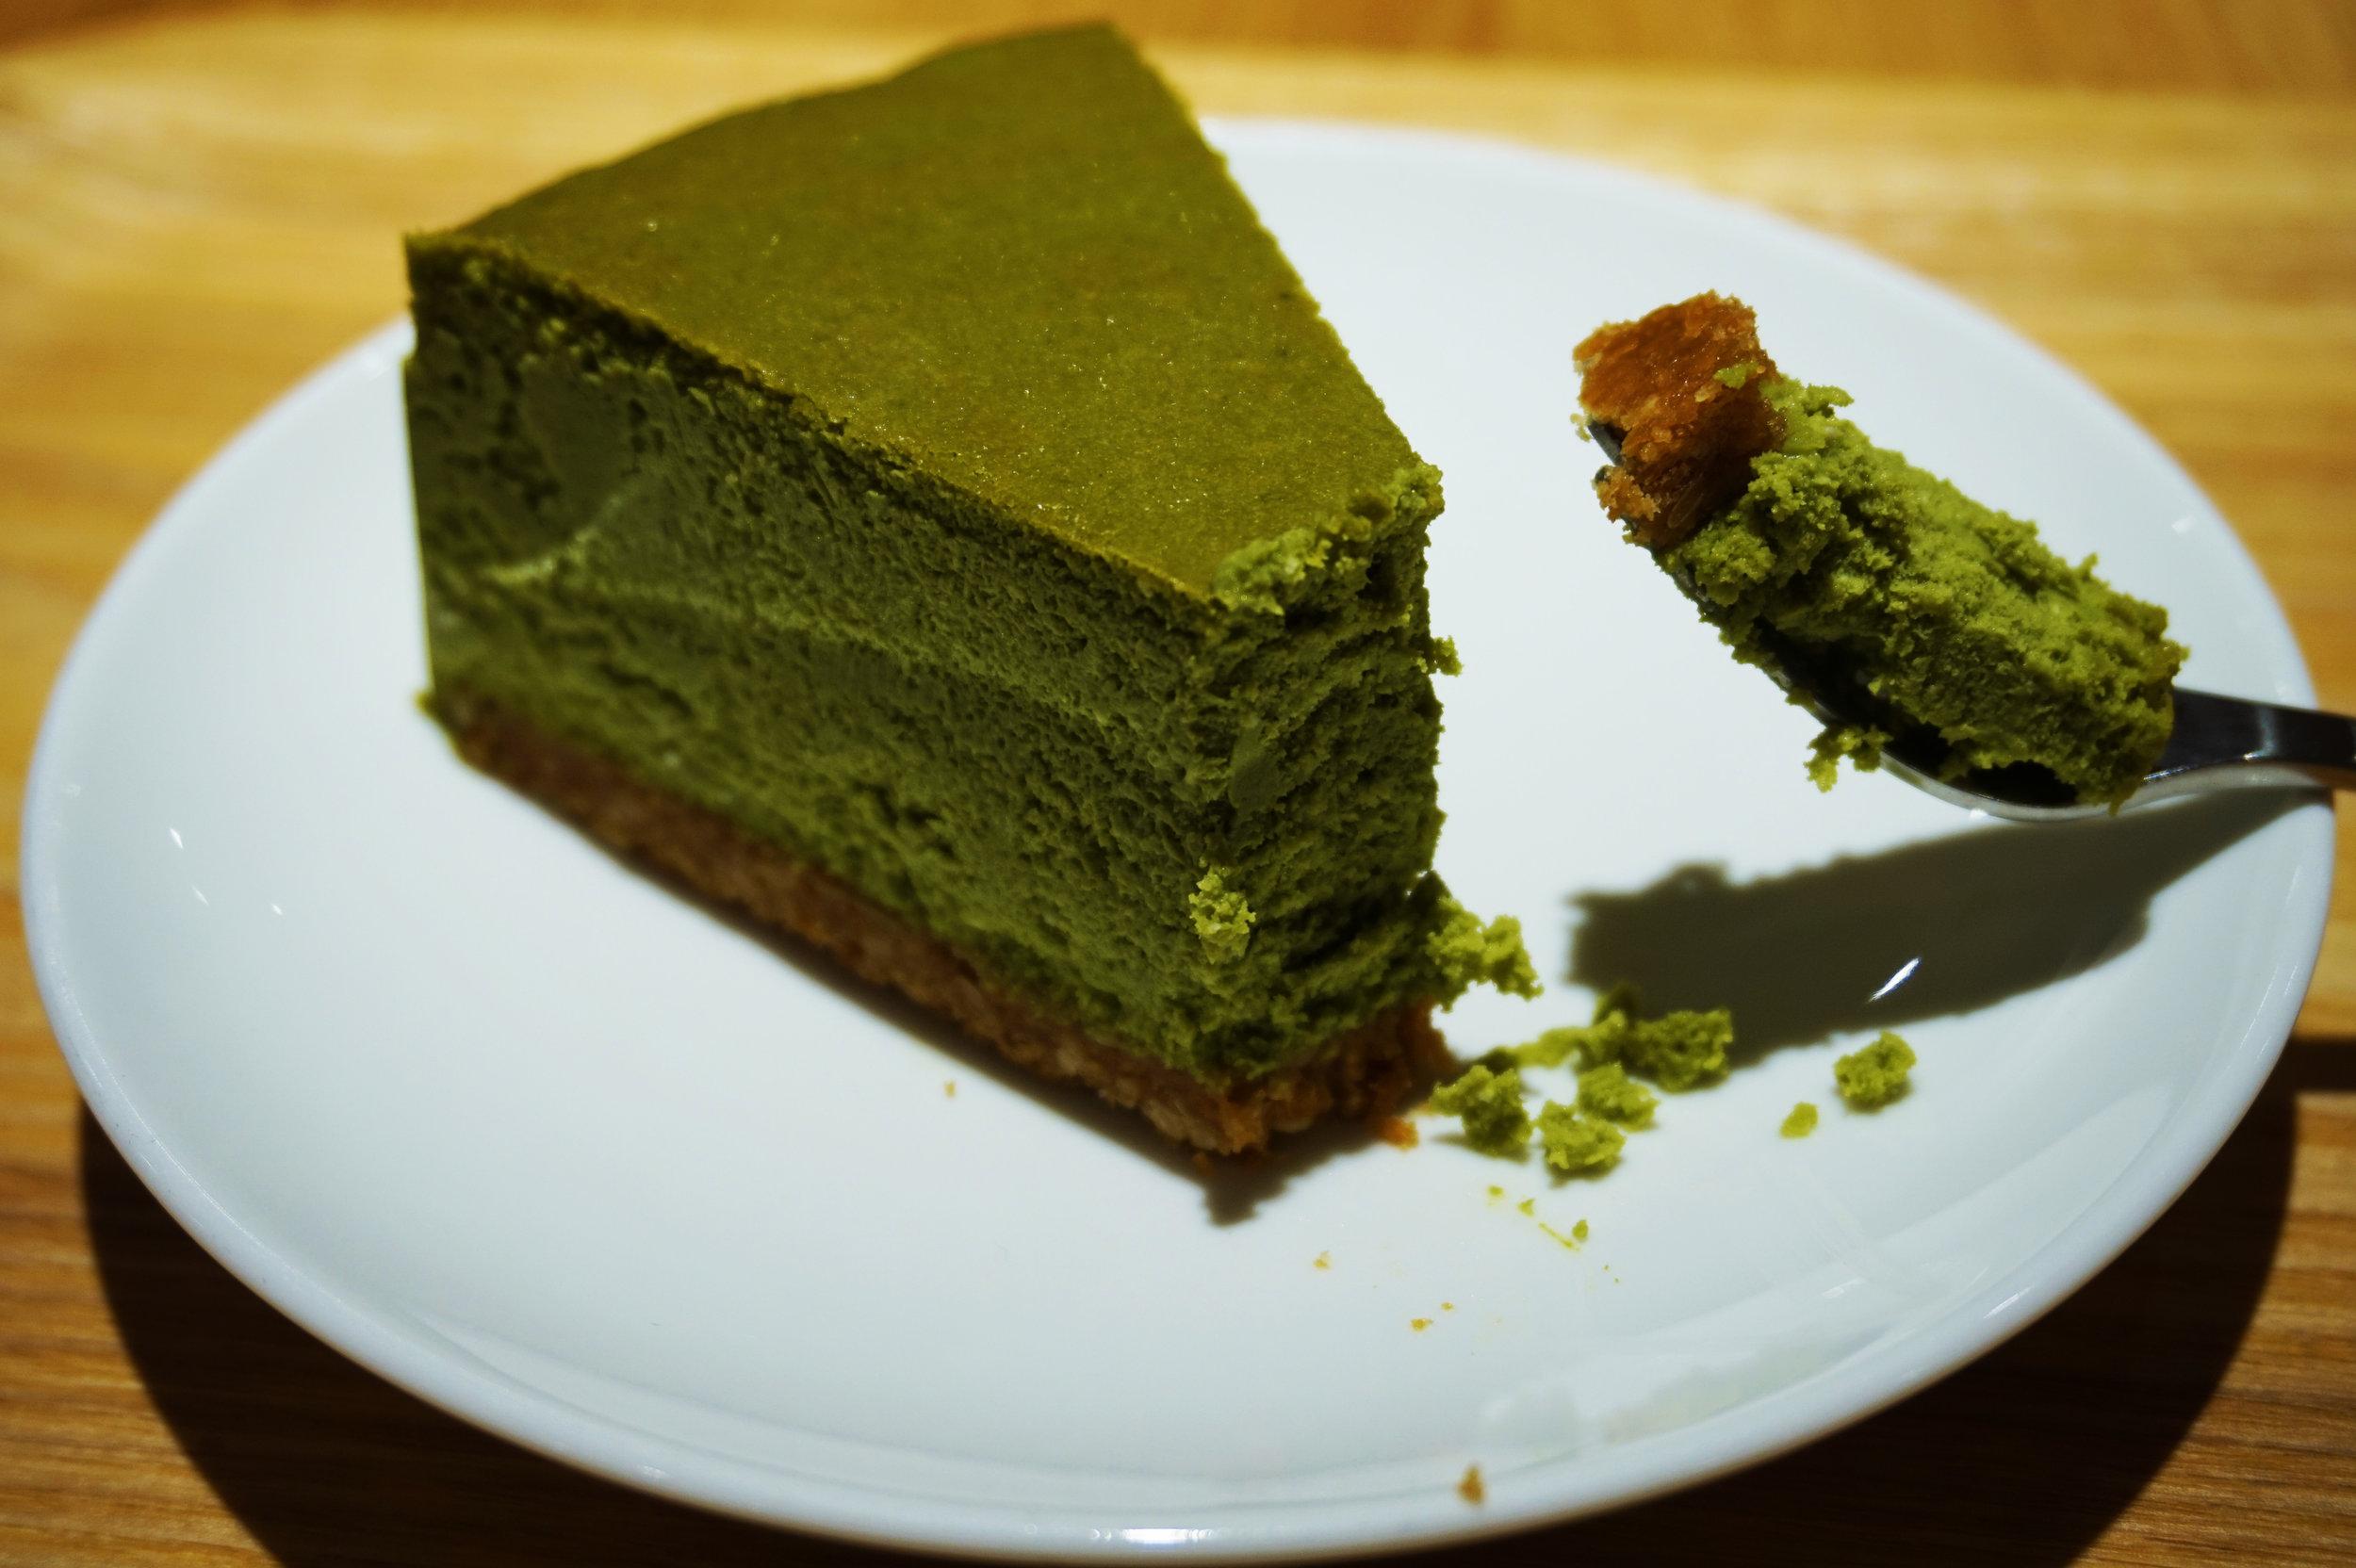 Matcha cheesecake from Muji Cafe